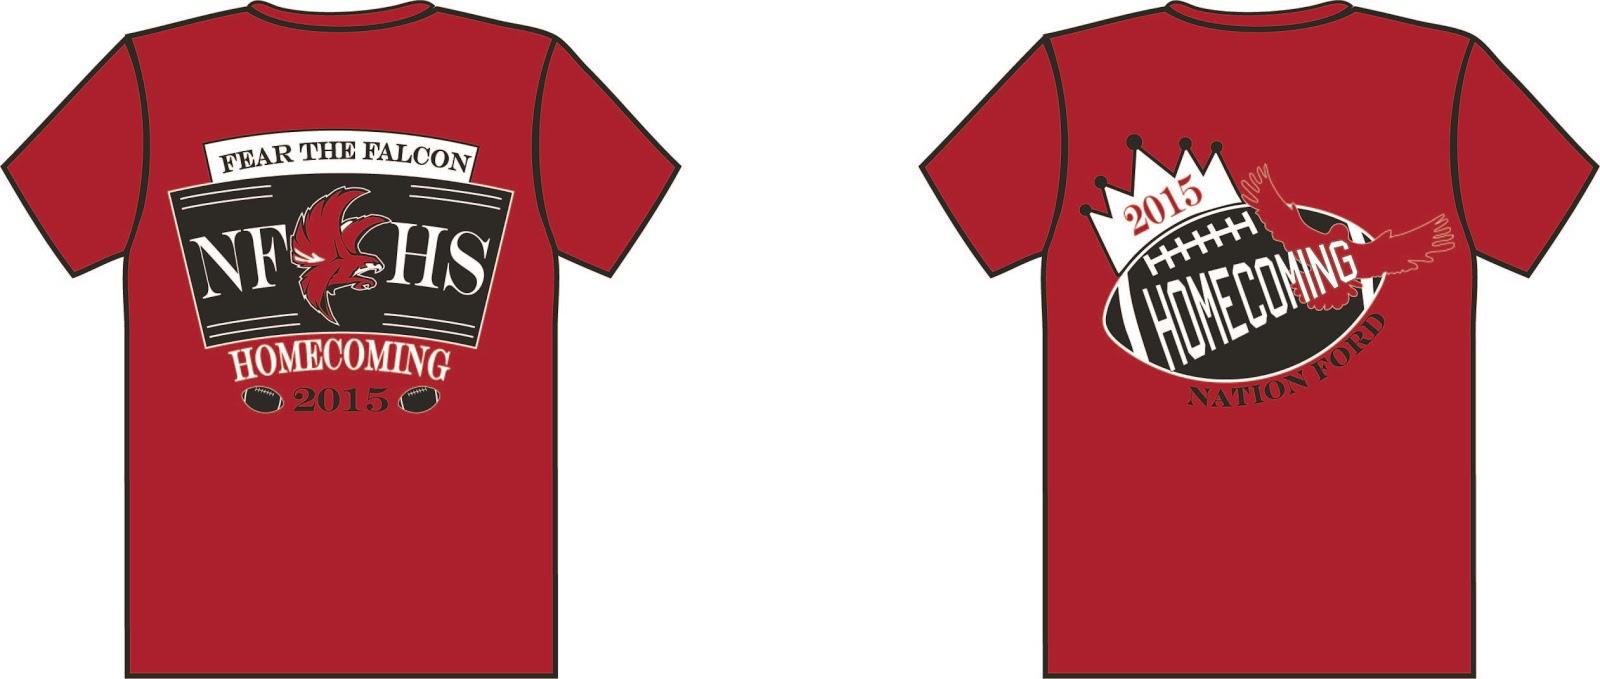 Digital Art Design 2015 Homecoming Shirt Designs